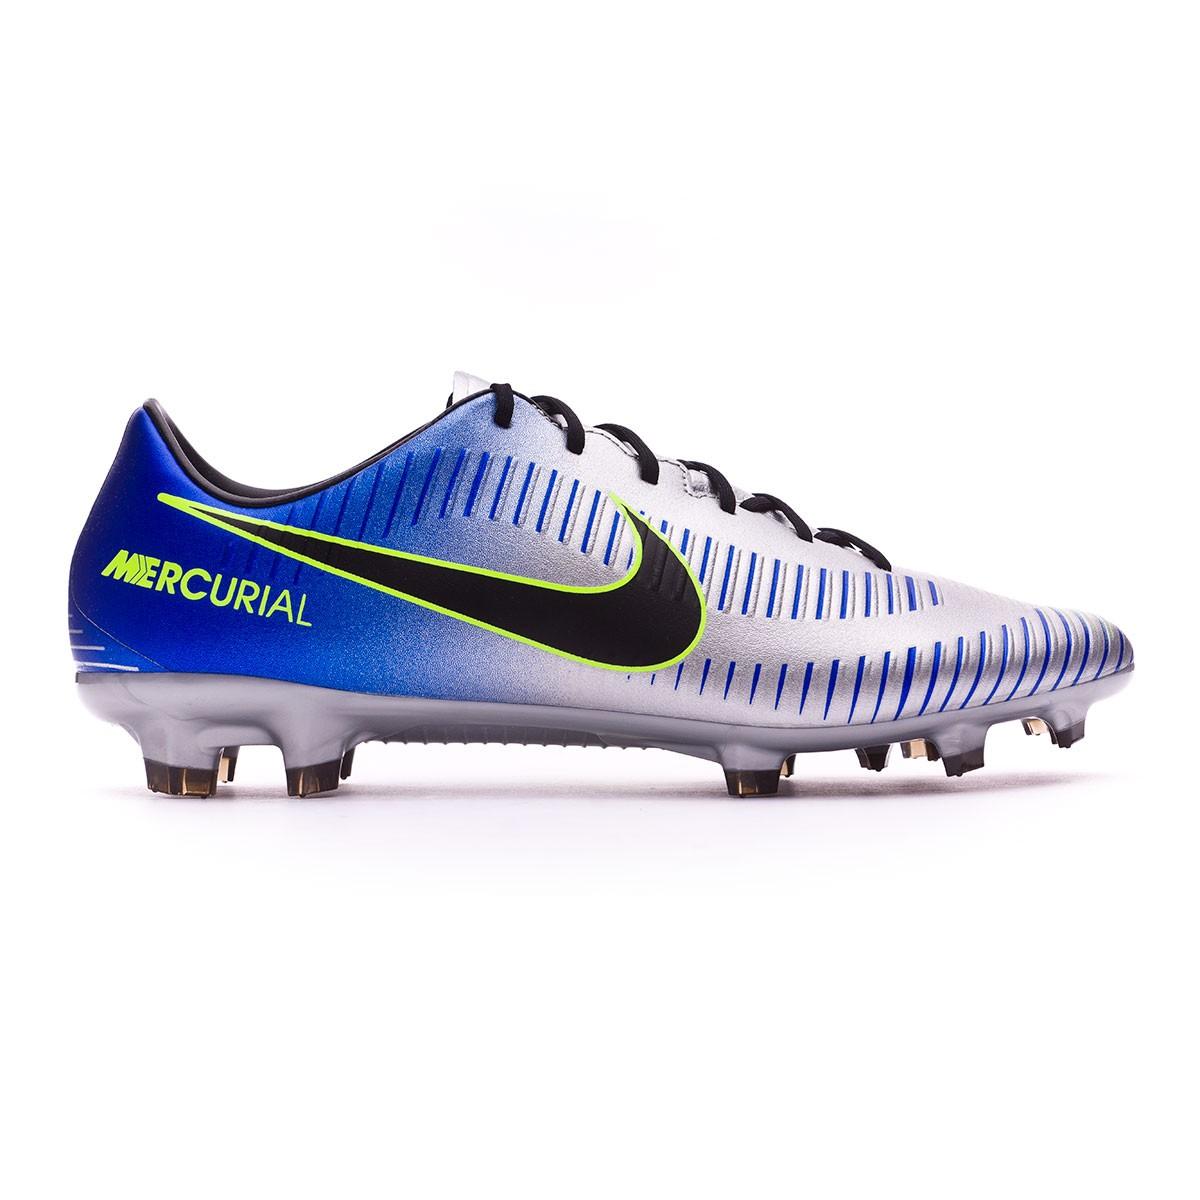 f80ad77ad Football Boots Nike Mercurial Veloce III FG Neymar Racer blue-Black-Chrome-Volt  - Tienda de fútbol Fútbol Emotion